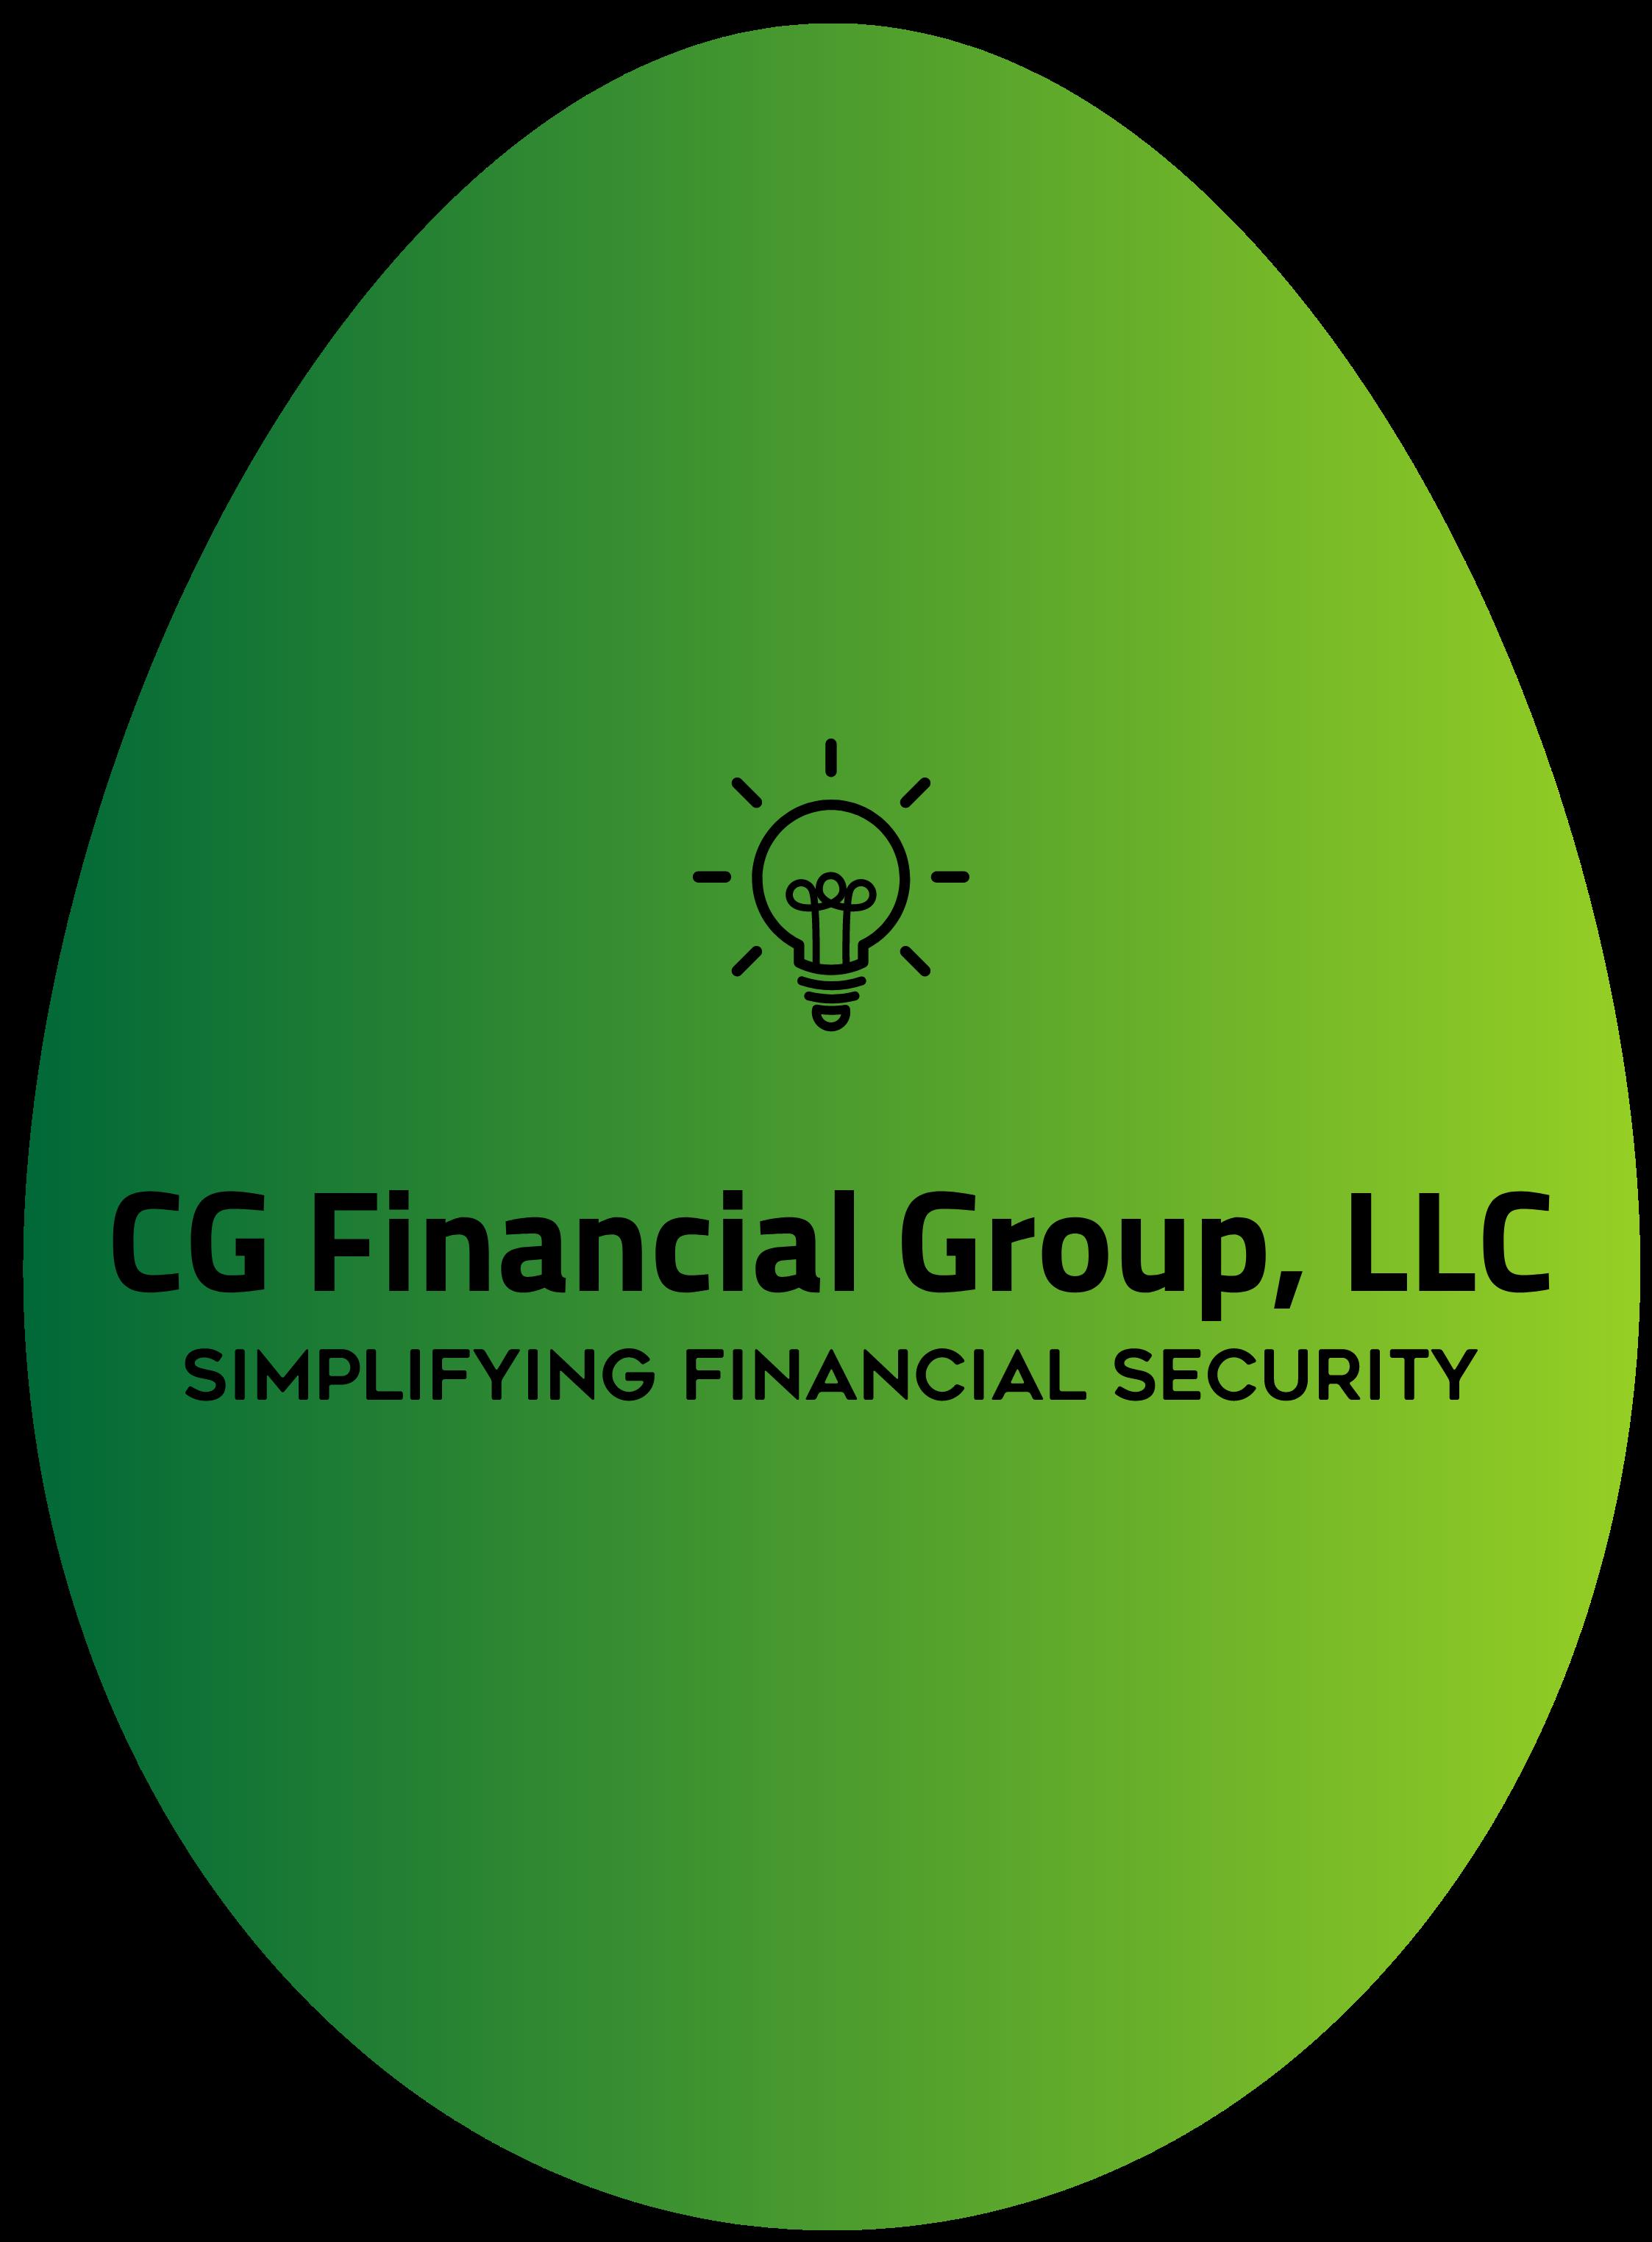 CG Financial Group, LLC